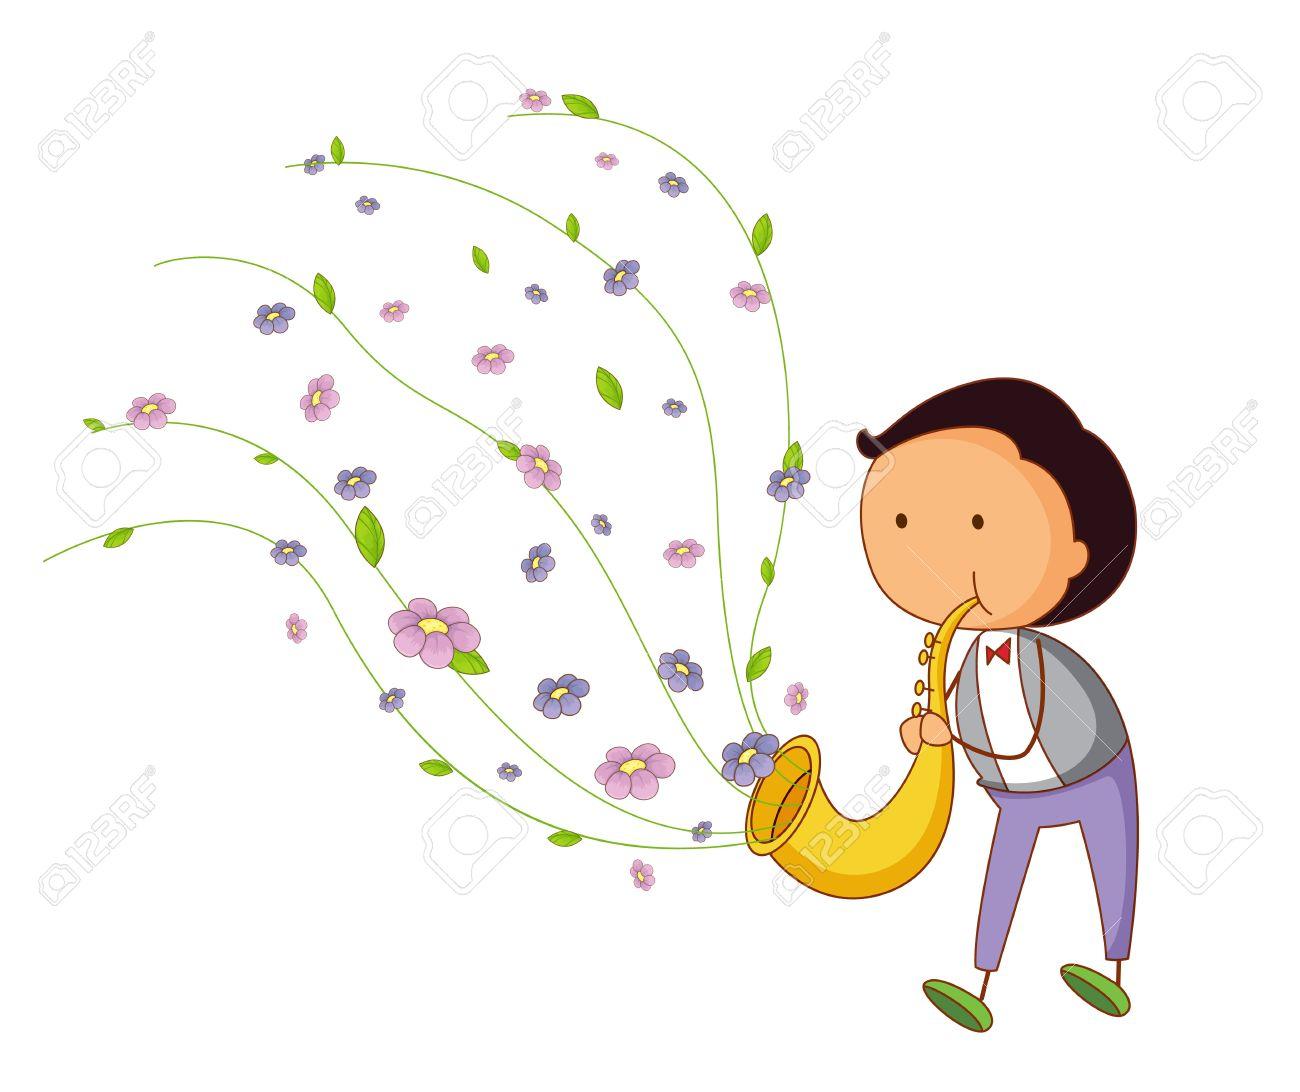 trumpet vine flower stock photos royalty free trumpet vine flower